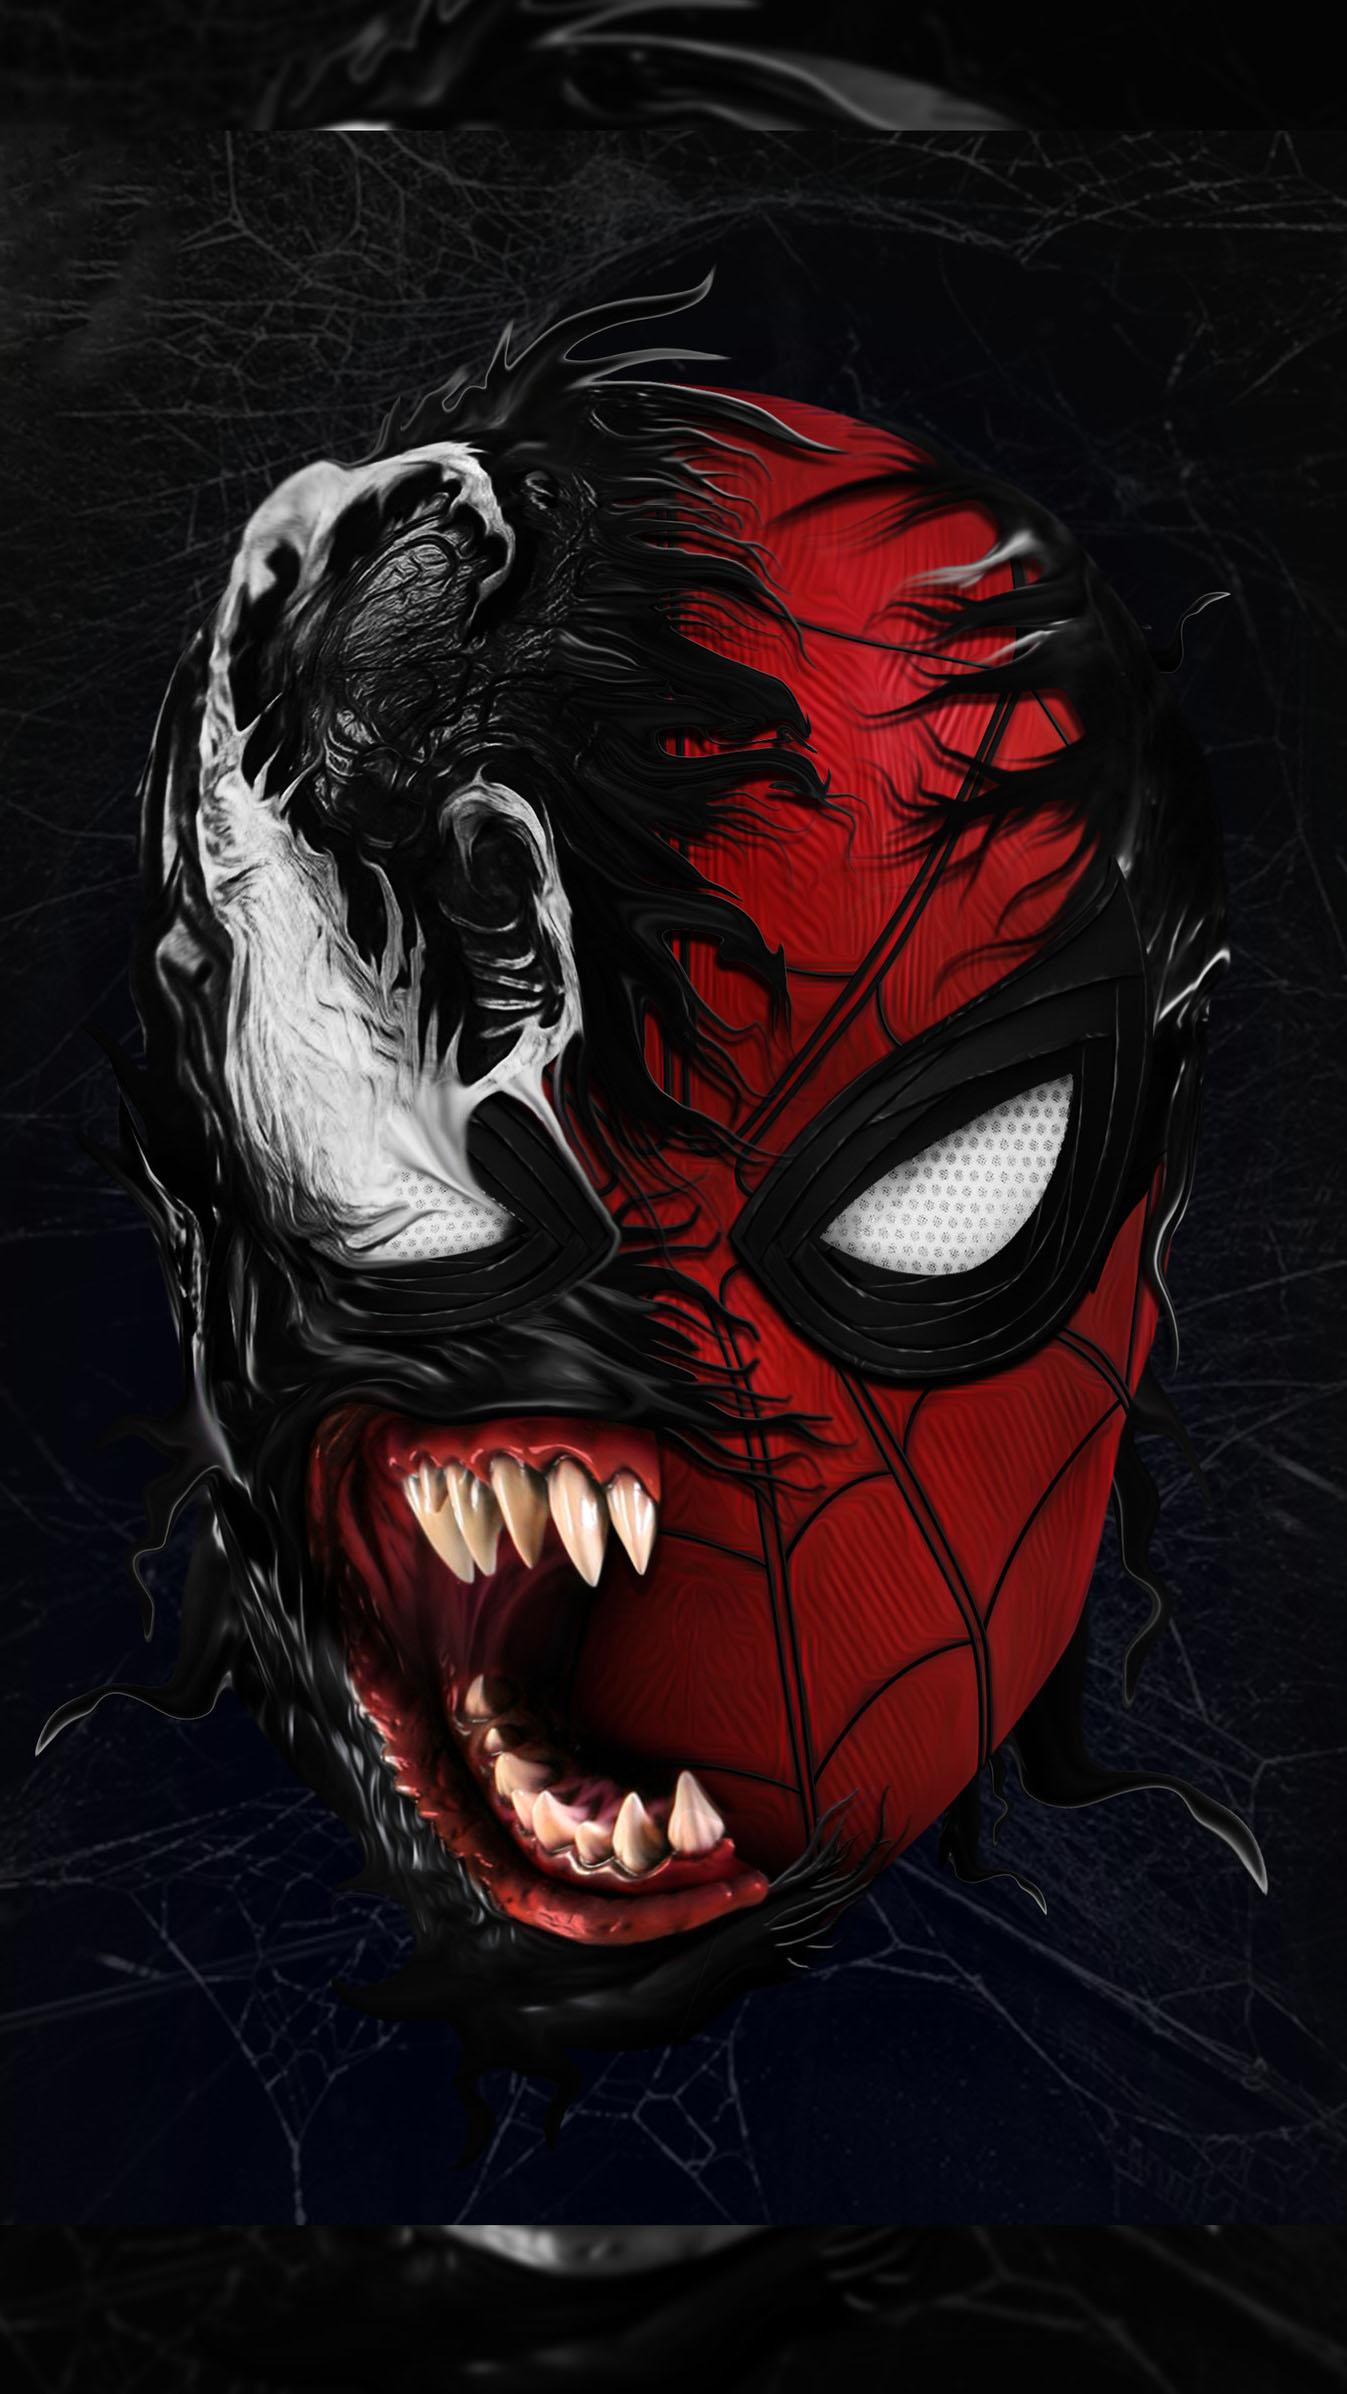 Cute Man Wallpaper Spidey Venom Iphone Wallpaper Iphone Wallpapers